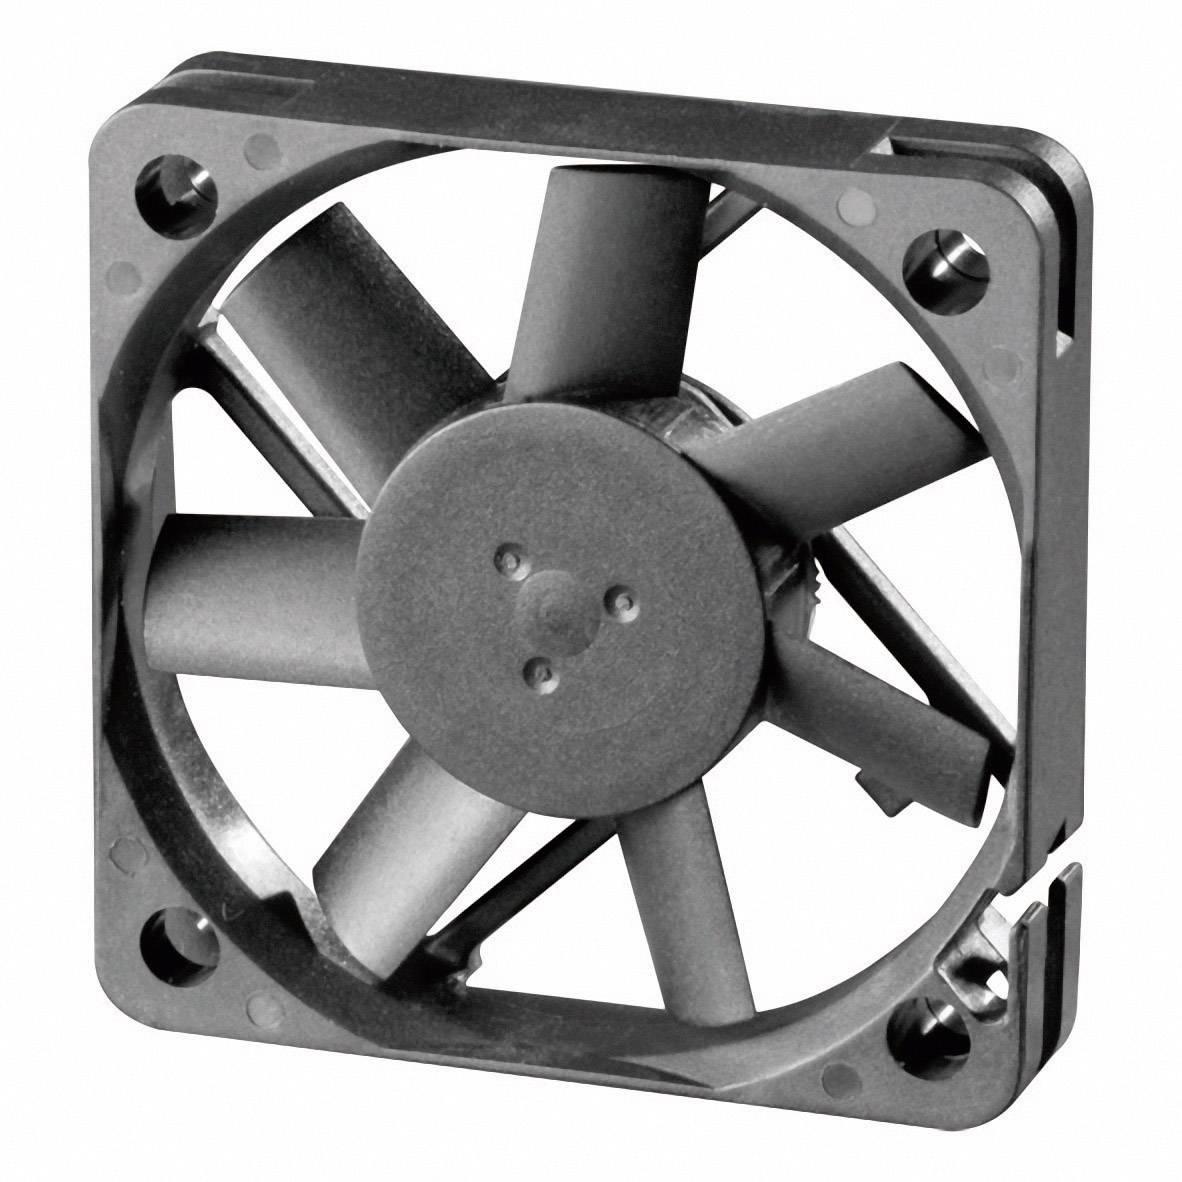 Axiálny ventilátor Sunon EB60201B1-000U-999 EB60201B1-000U-999, 12 V/DC, 34.5 dB, (d x š x v) 60 x 60 x 20 mm